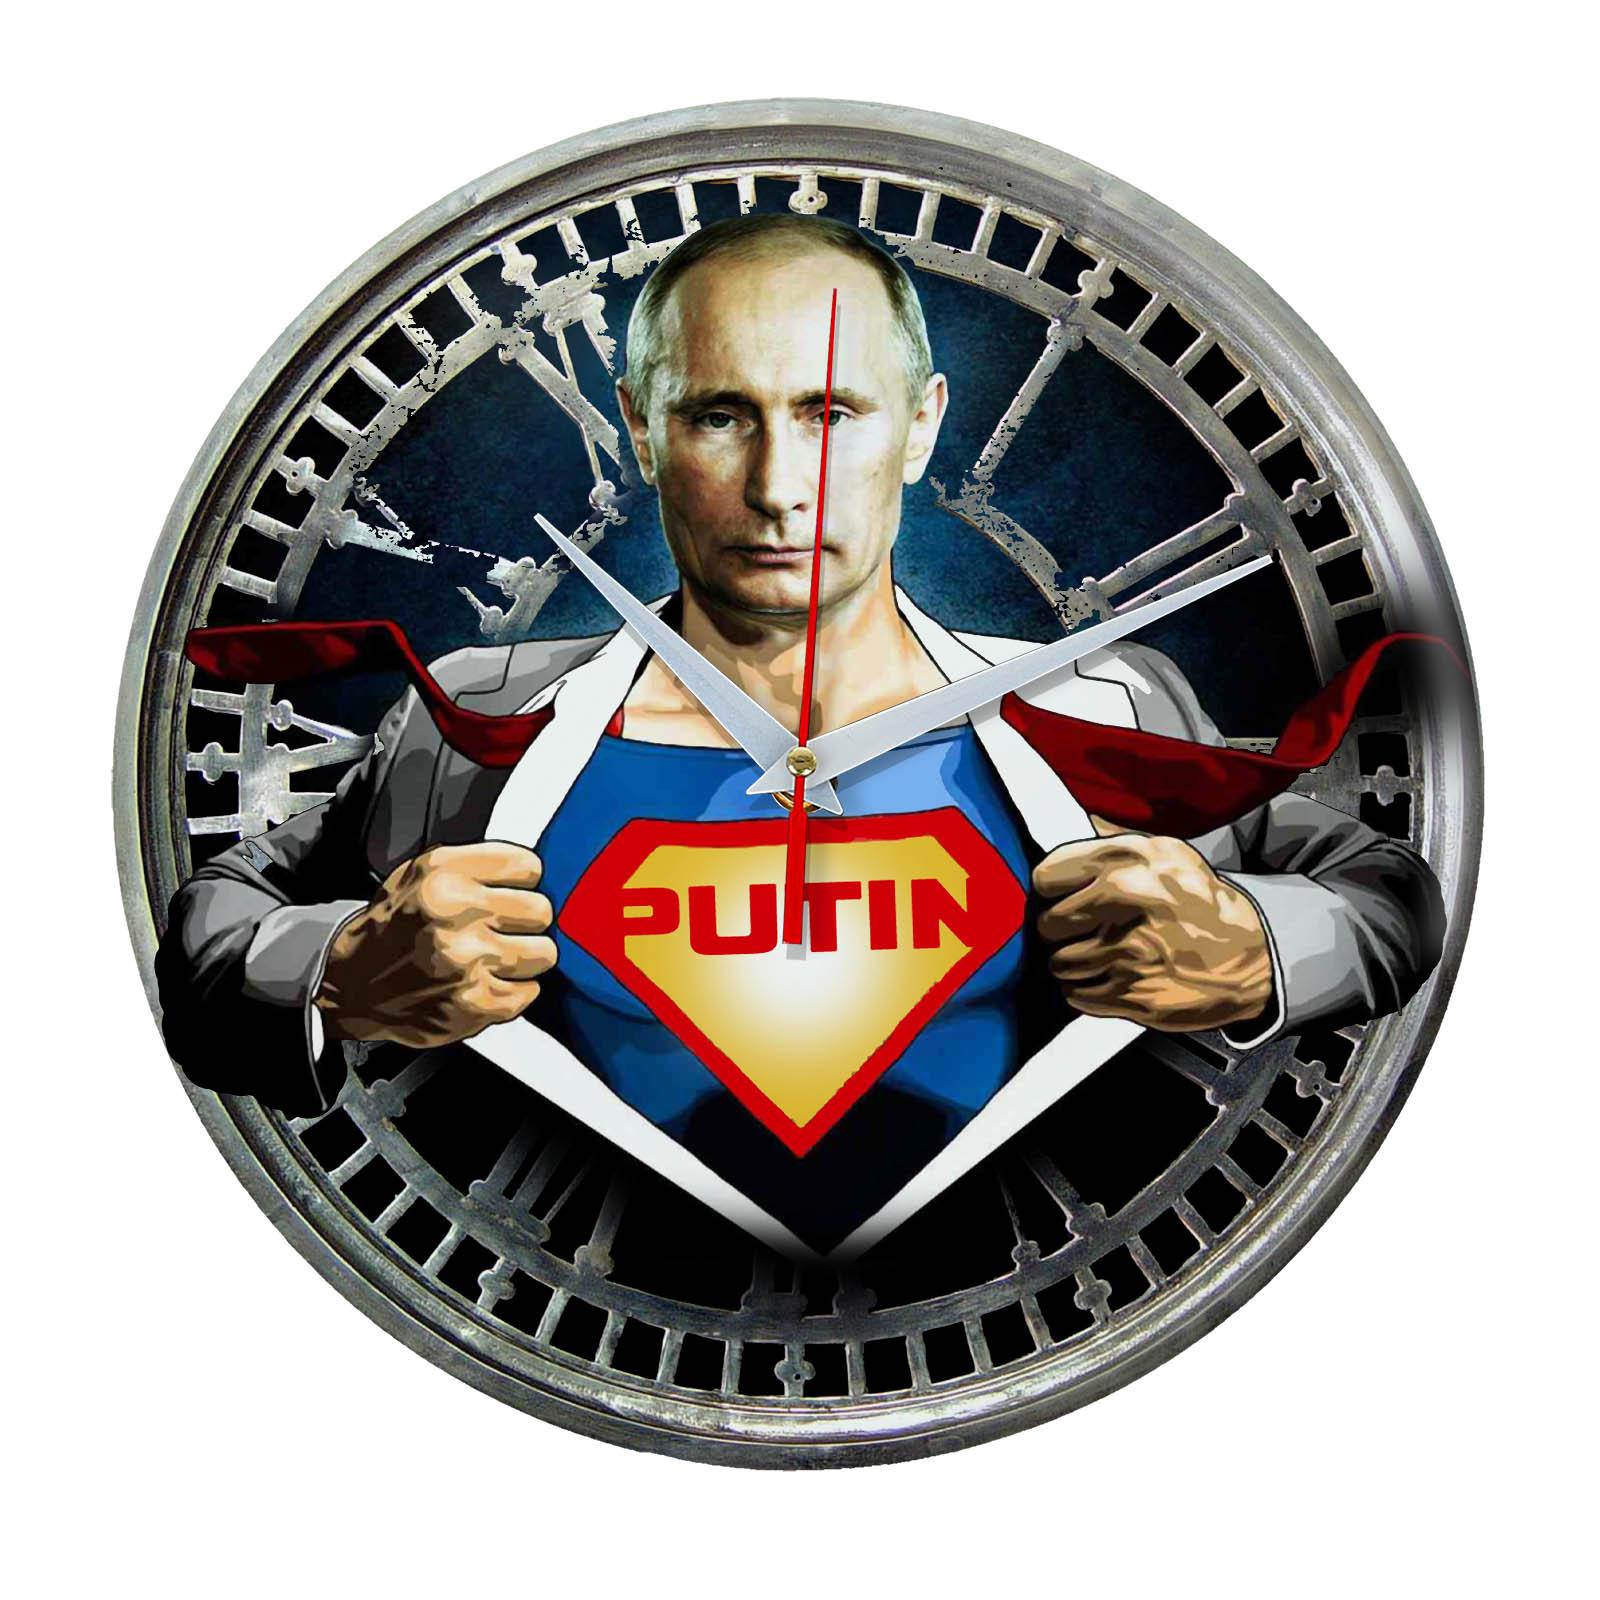 clock_rossia18_0014_temn-krug